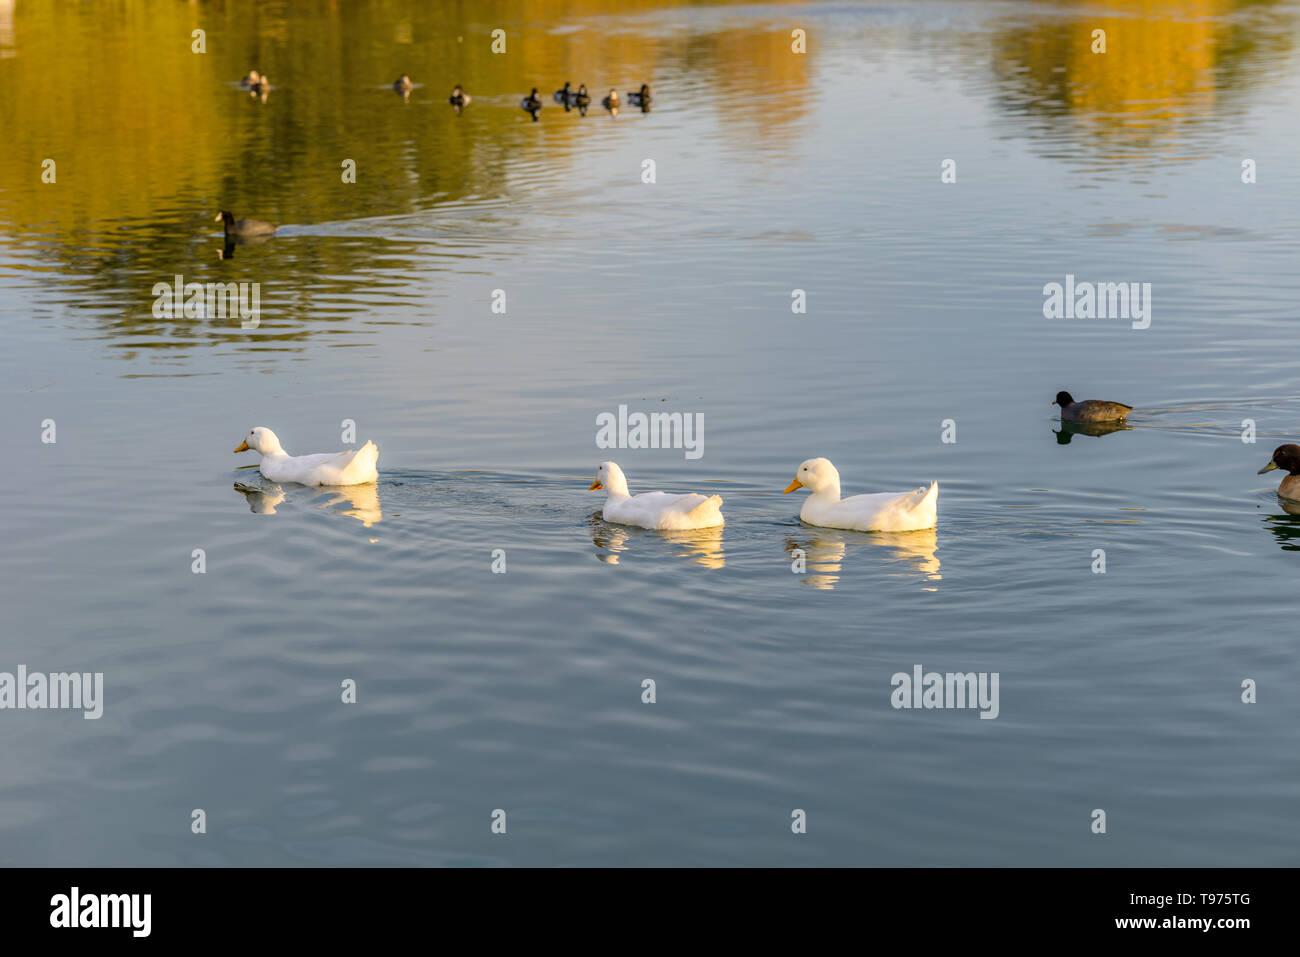 White Ducks On Sunset Lake - A group of white American Pekin ducks swimming on a sunset autumn lake. Veterans Oasis Lake, Chandler, Arizona, USA. - Stock Image